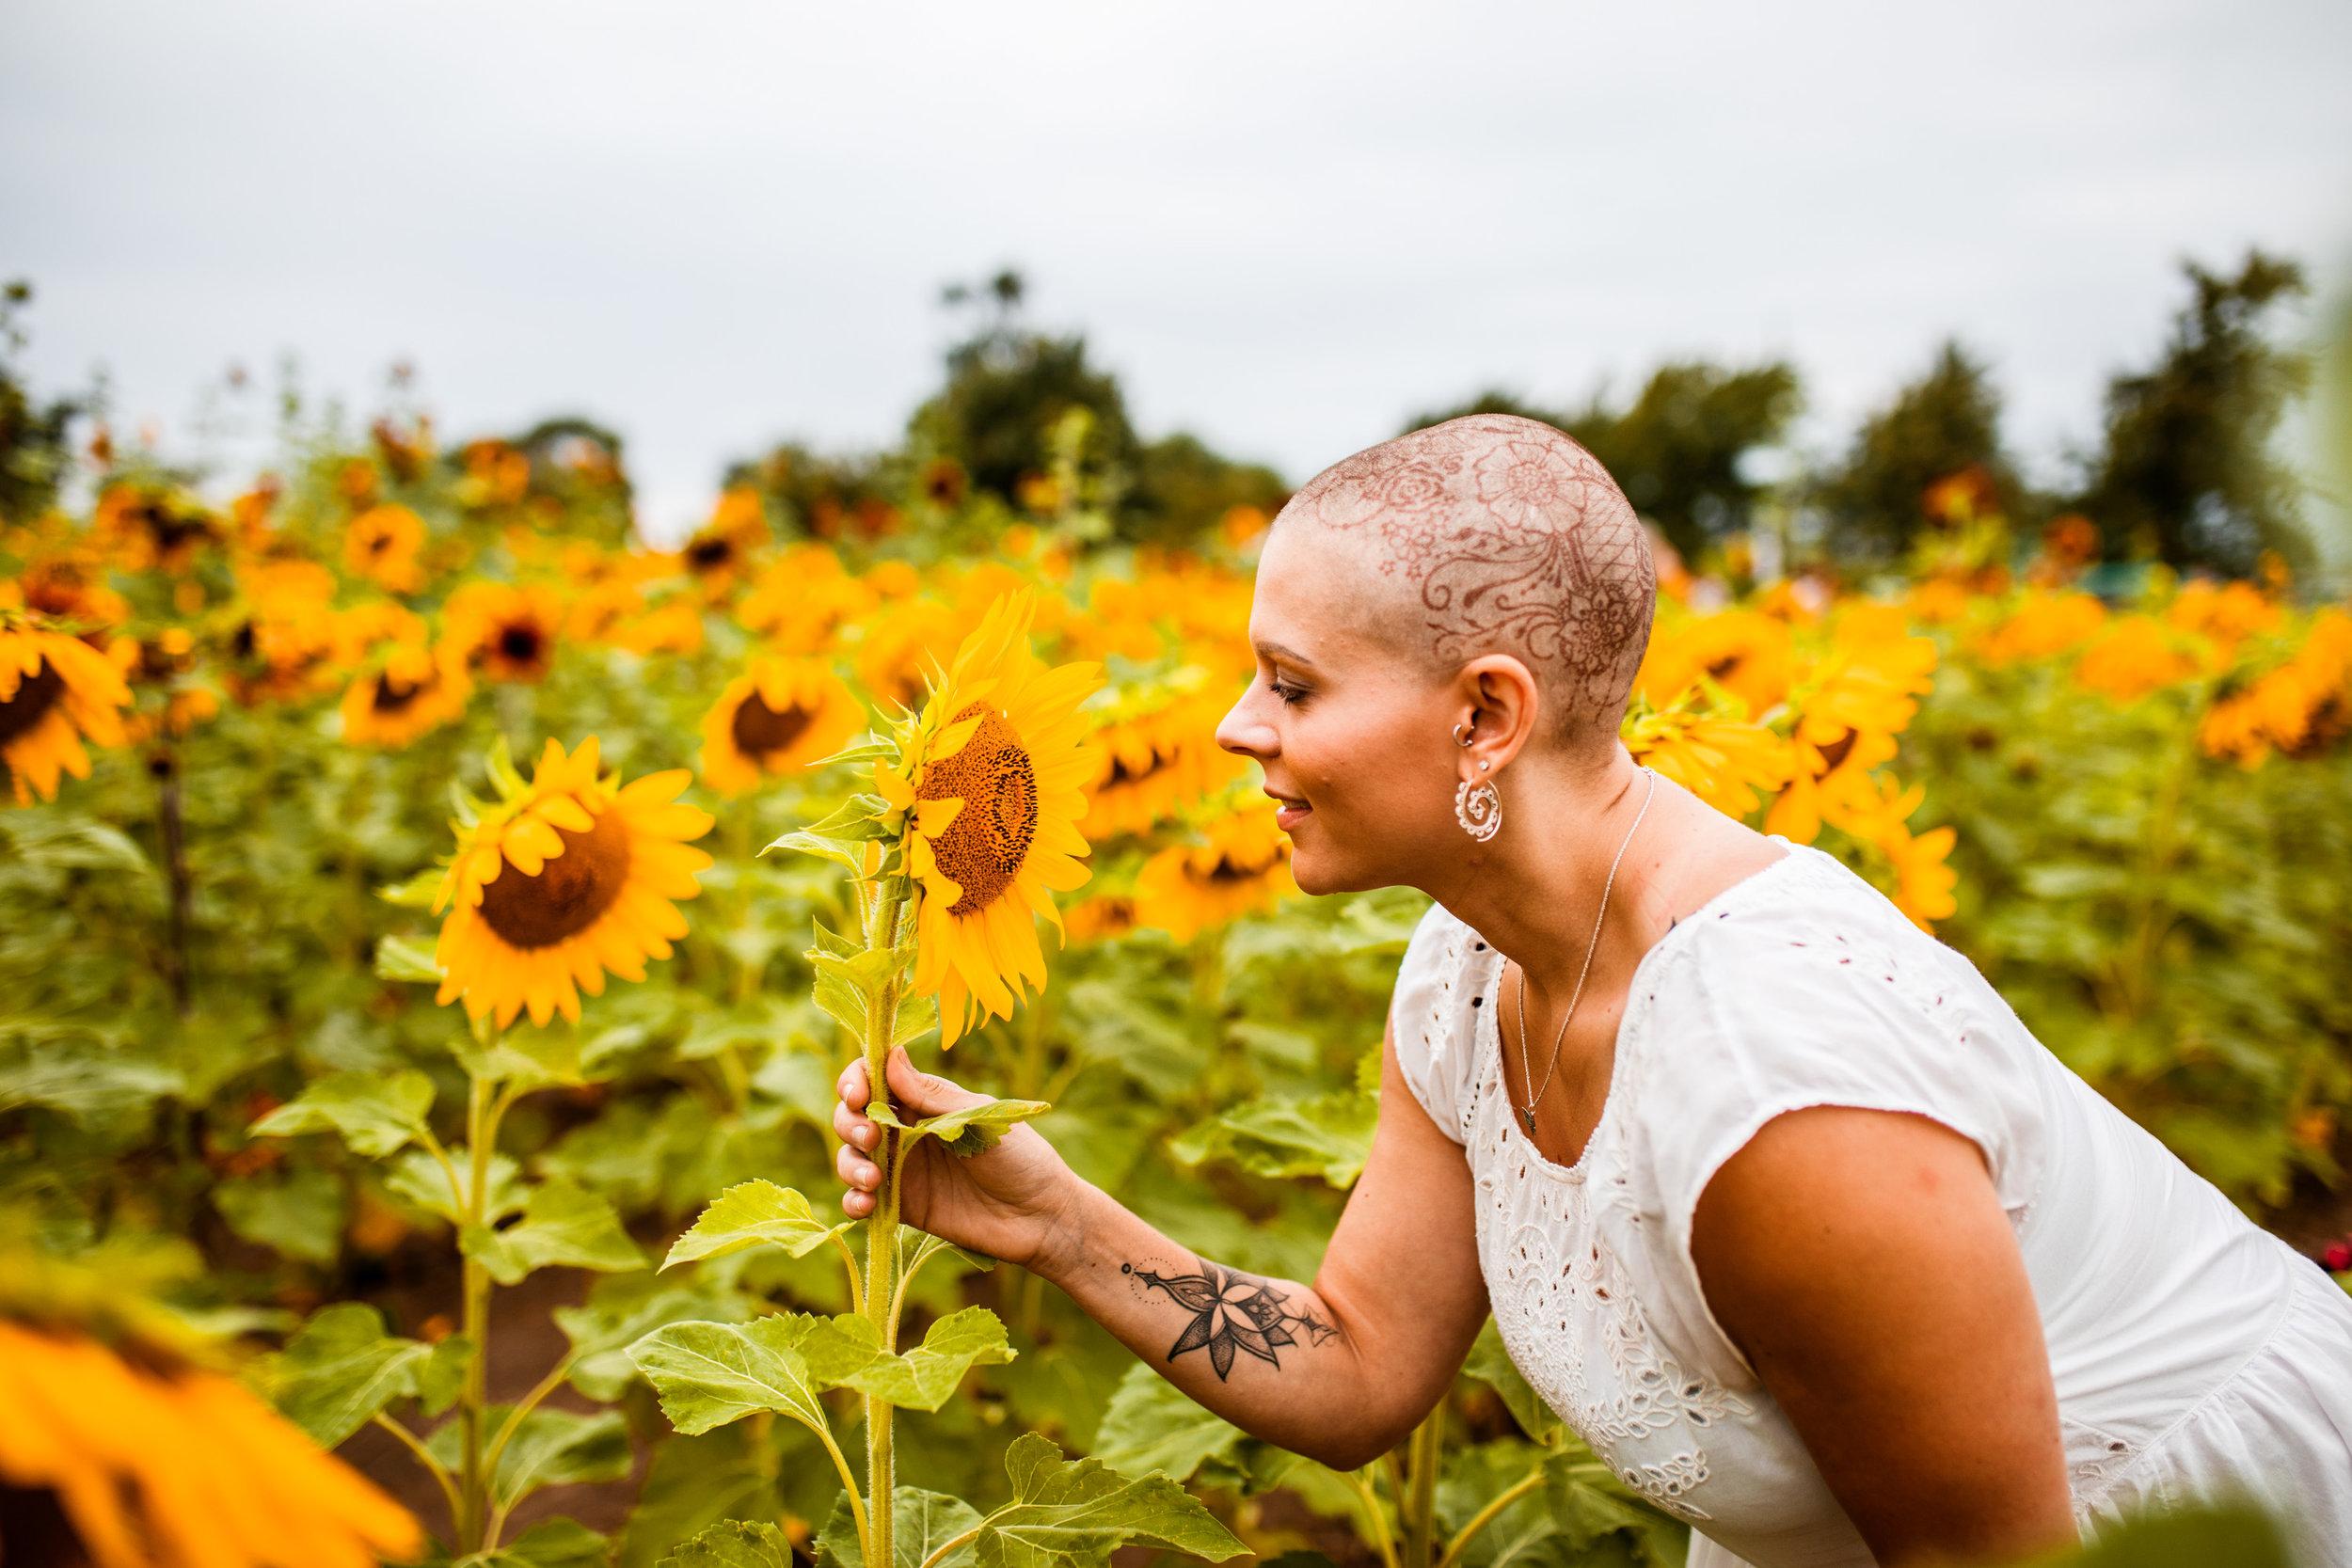 Steph_Sunflowers-28.jpg